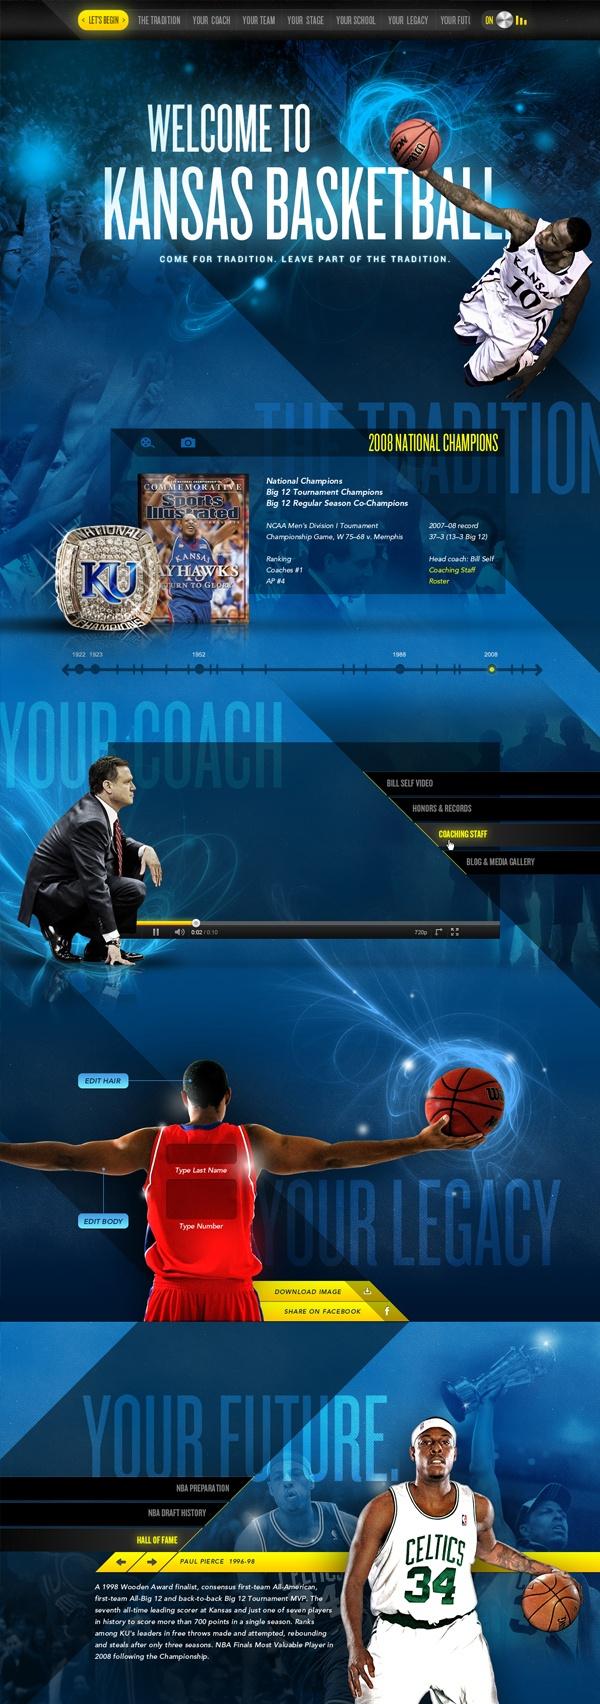 Kansas Basketball proof of concept web design (Mark Unger)